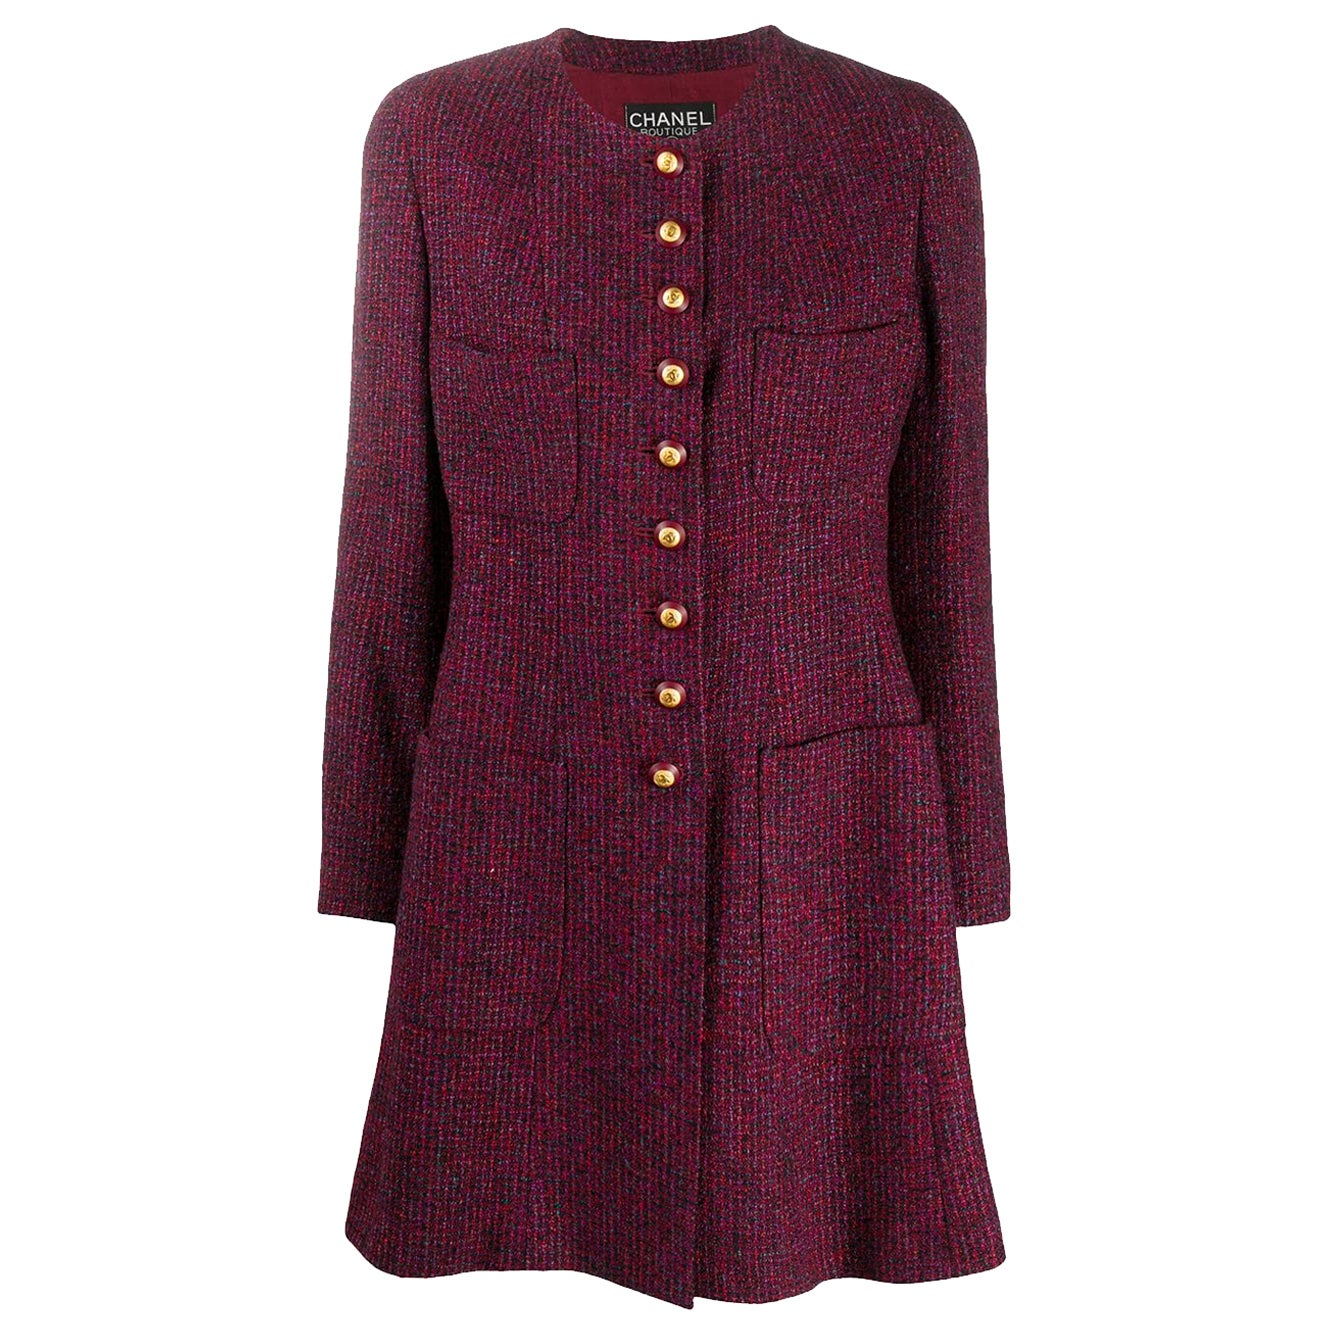 1993s Chanel Bordeaux Tweed Boucle Wool Coat Jacket